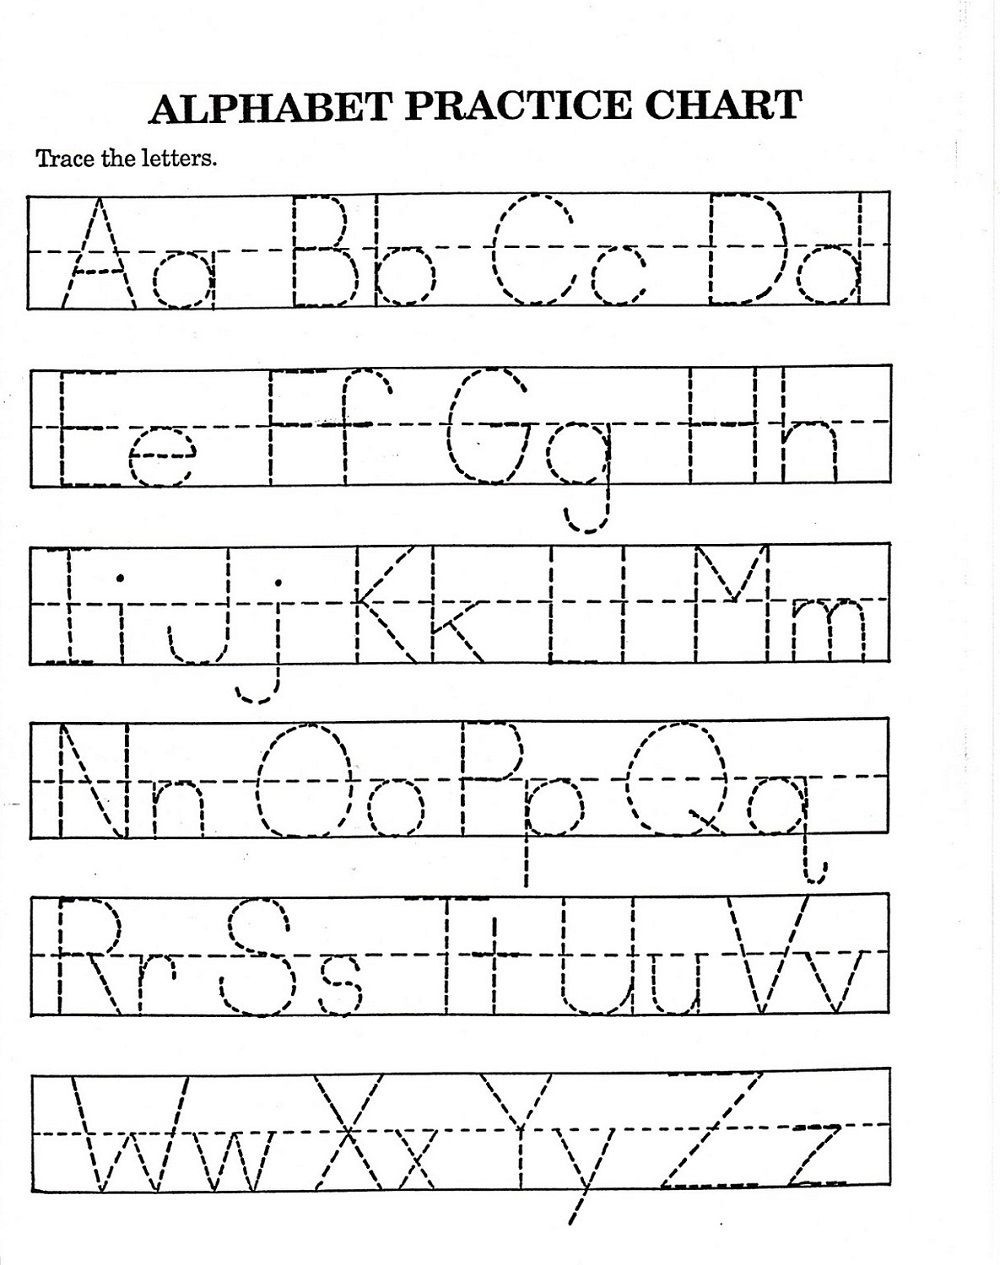 Traceable Alphabet Worksheets A Z Alphabet Worksheets Free Alphabet Worksheets Kindergarten Printable Alphabet Worksheets